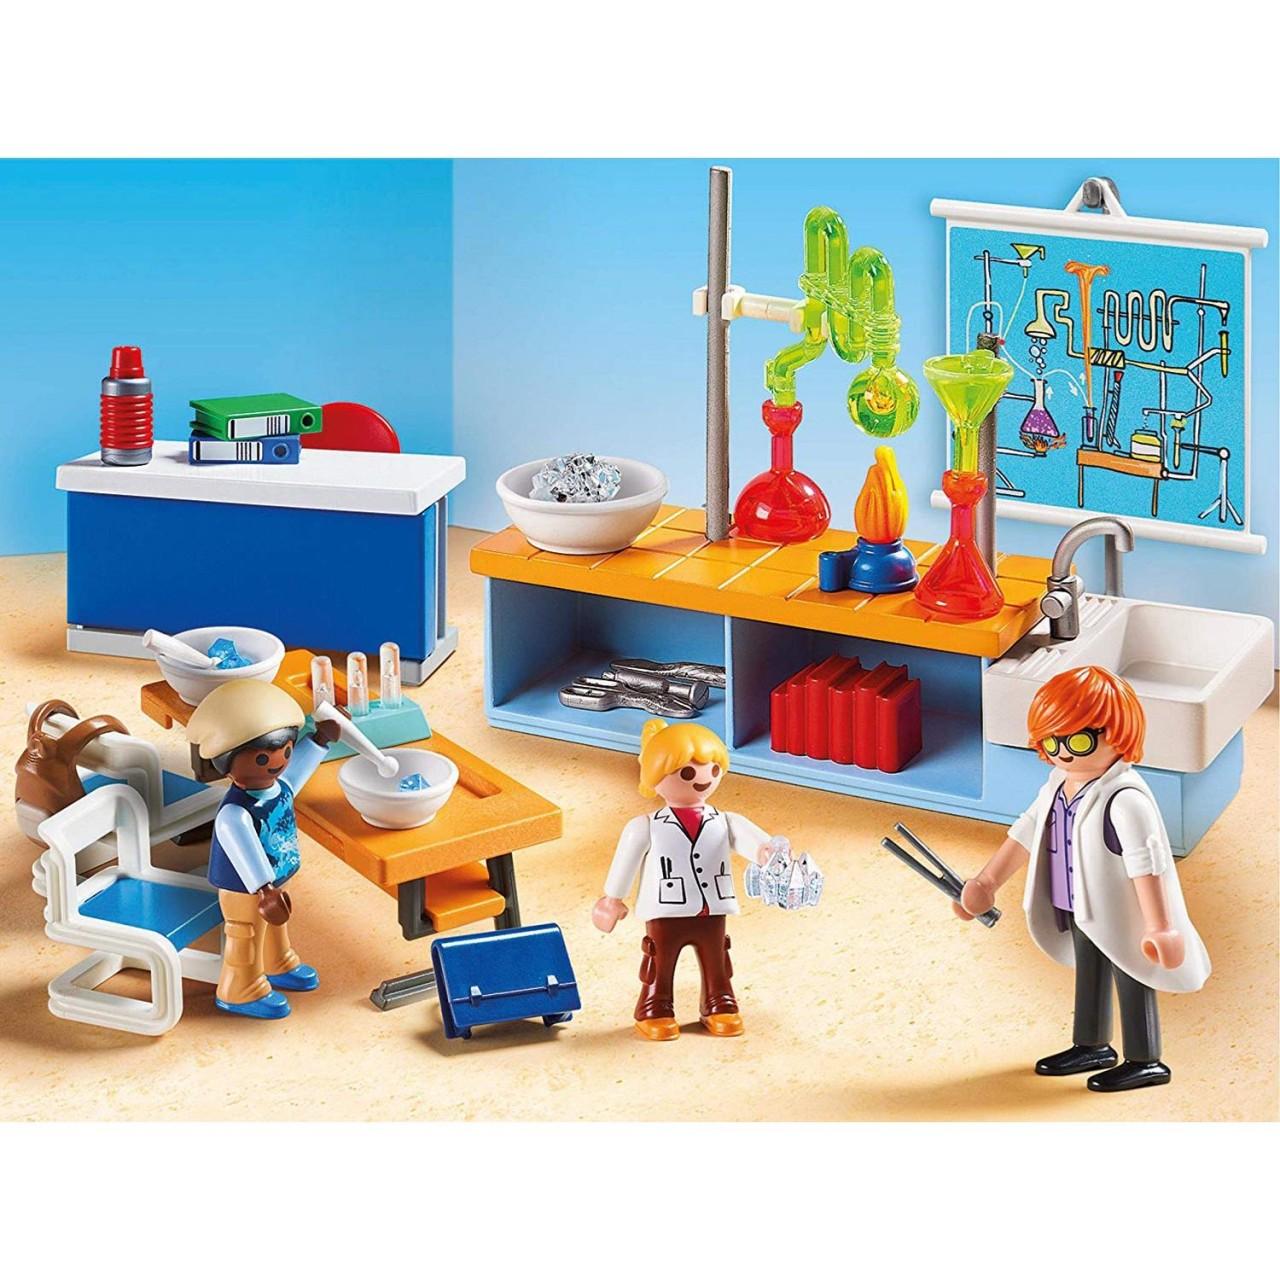 Playmobil 9456 Chemieunterricht